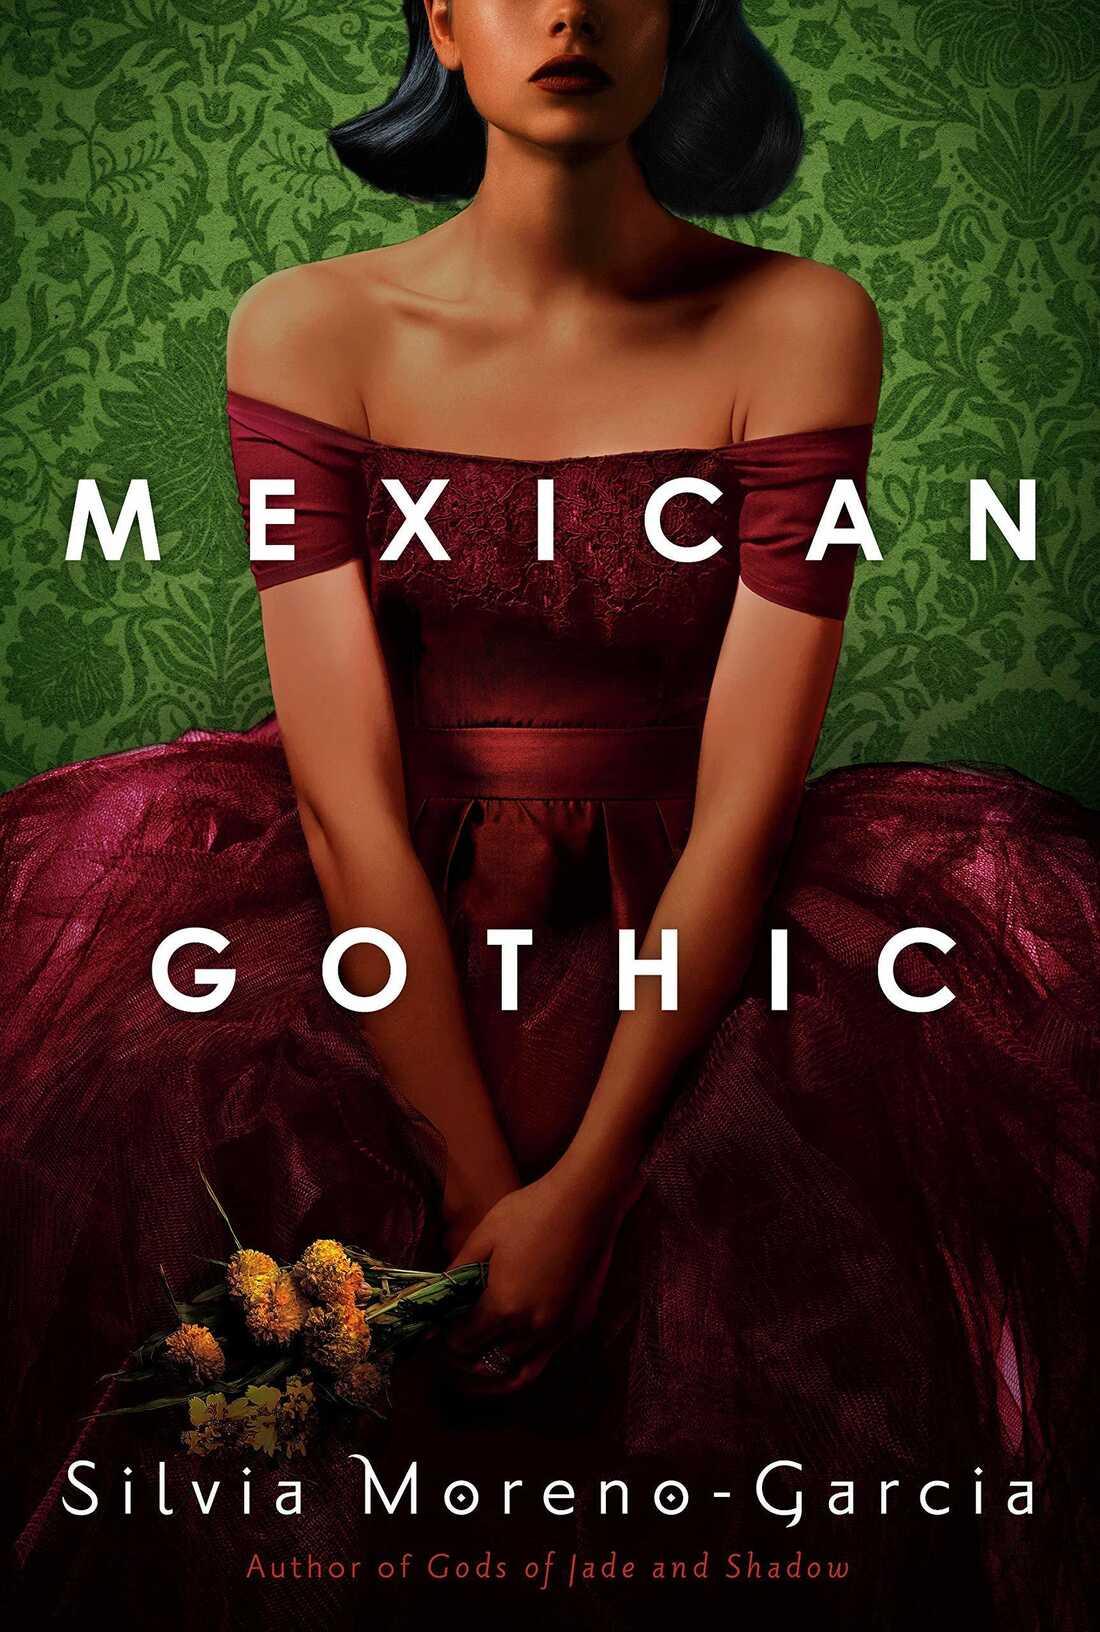 Mexican Gothic, by Silvia Moreno-Garcia